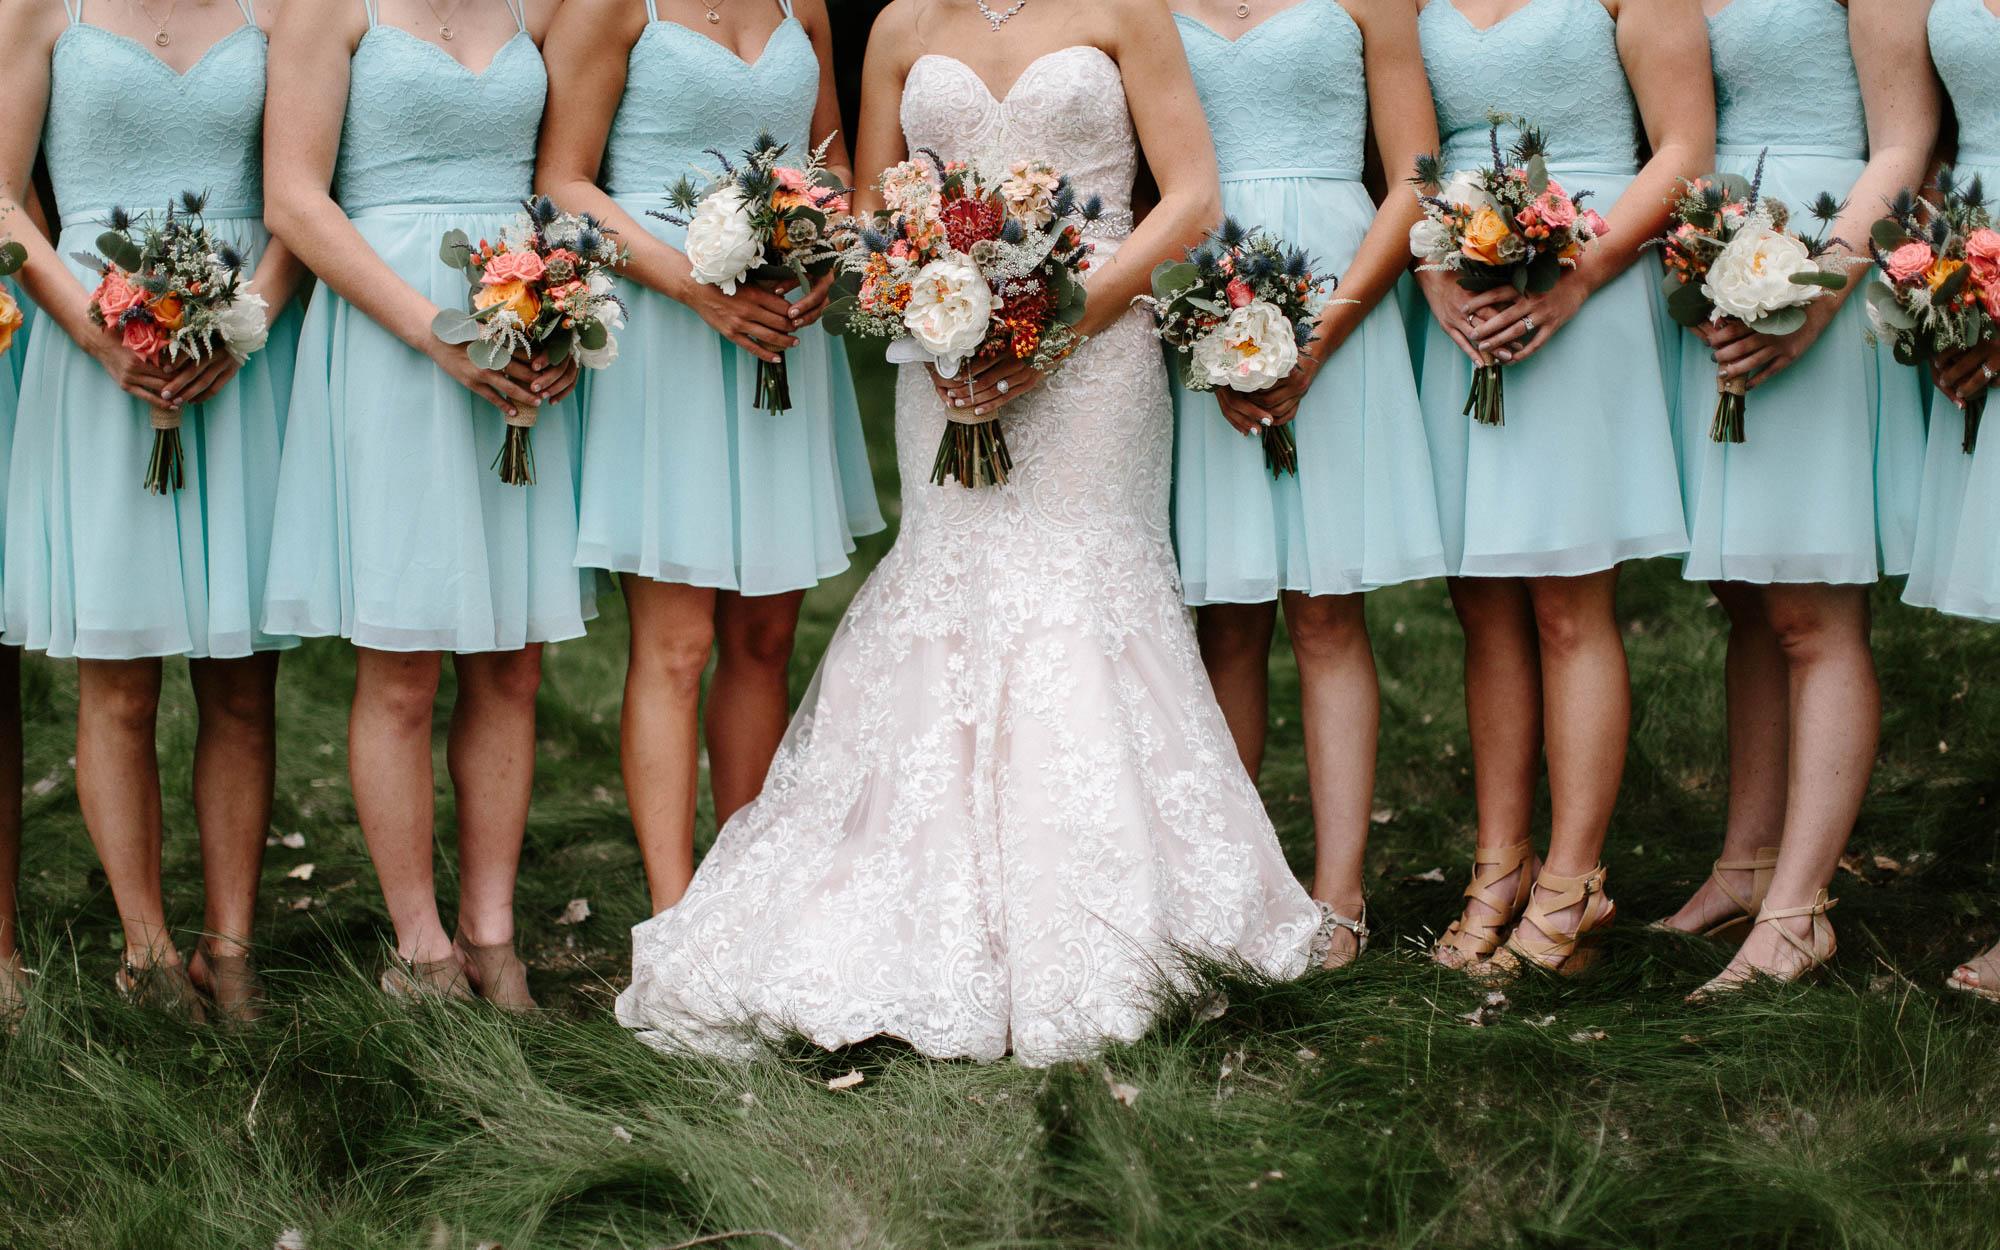 meadow-barn-wedding-sioux-falls-south-dakota-romantic-adventerous-michael-liedtke-photography044.jpg